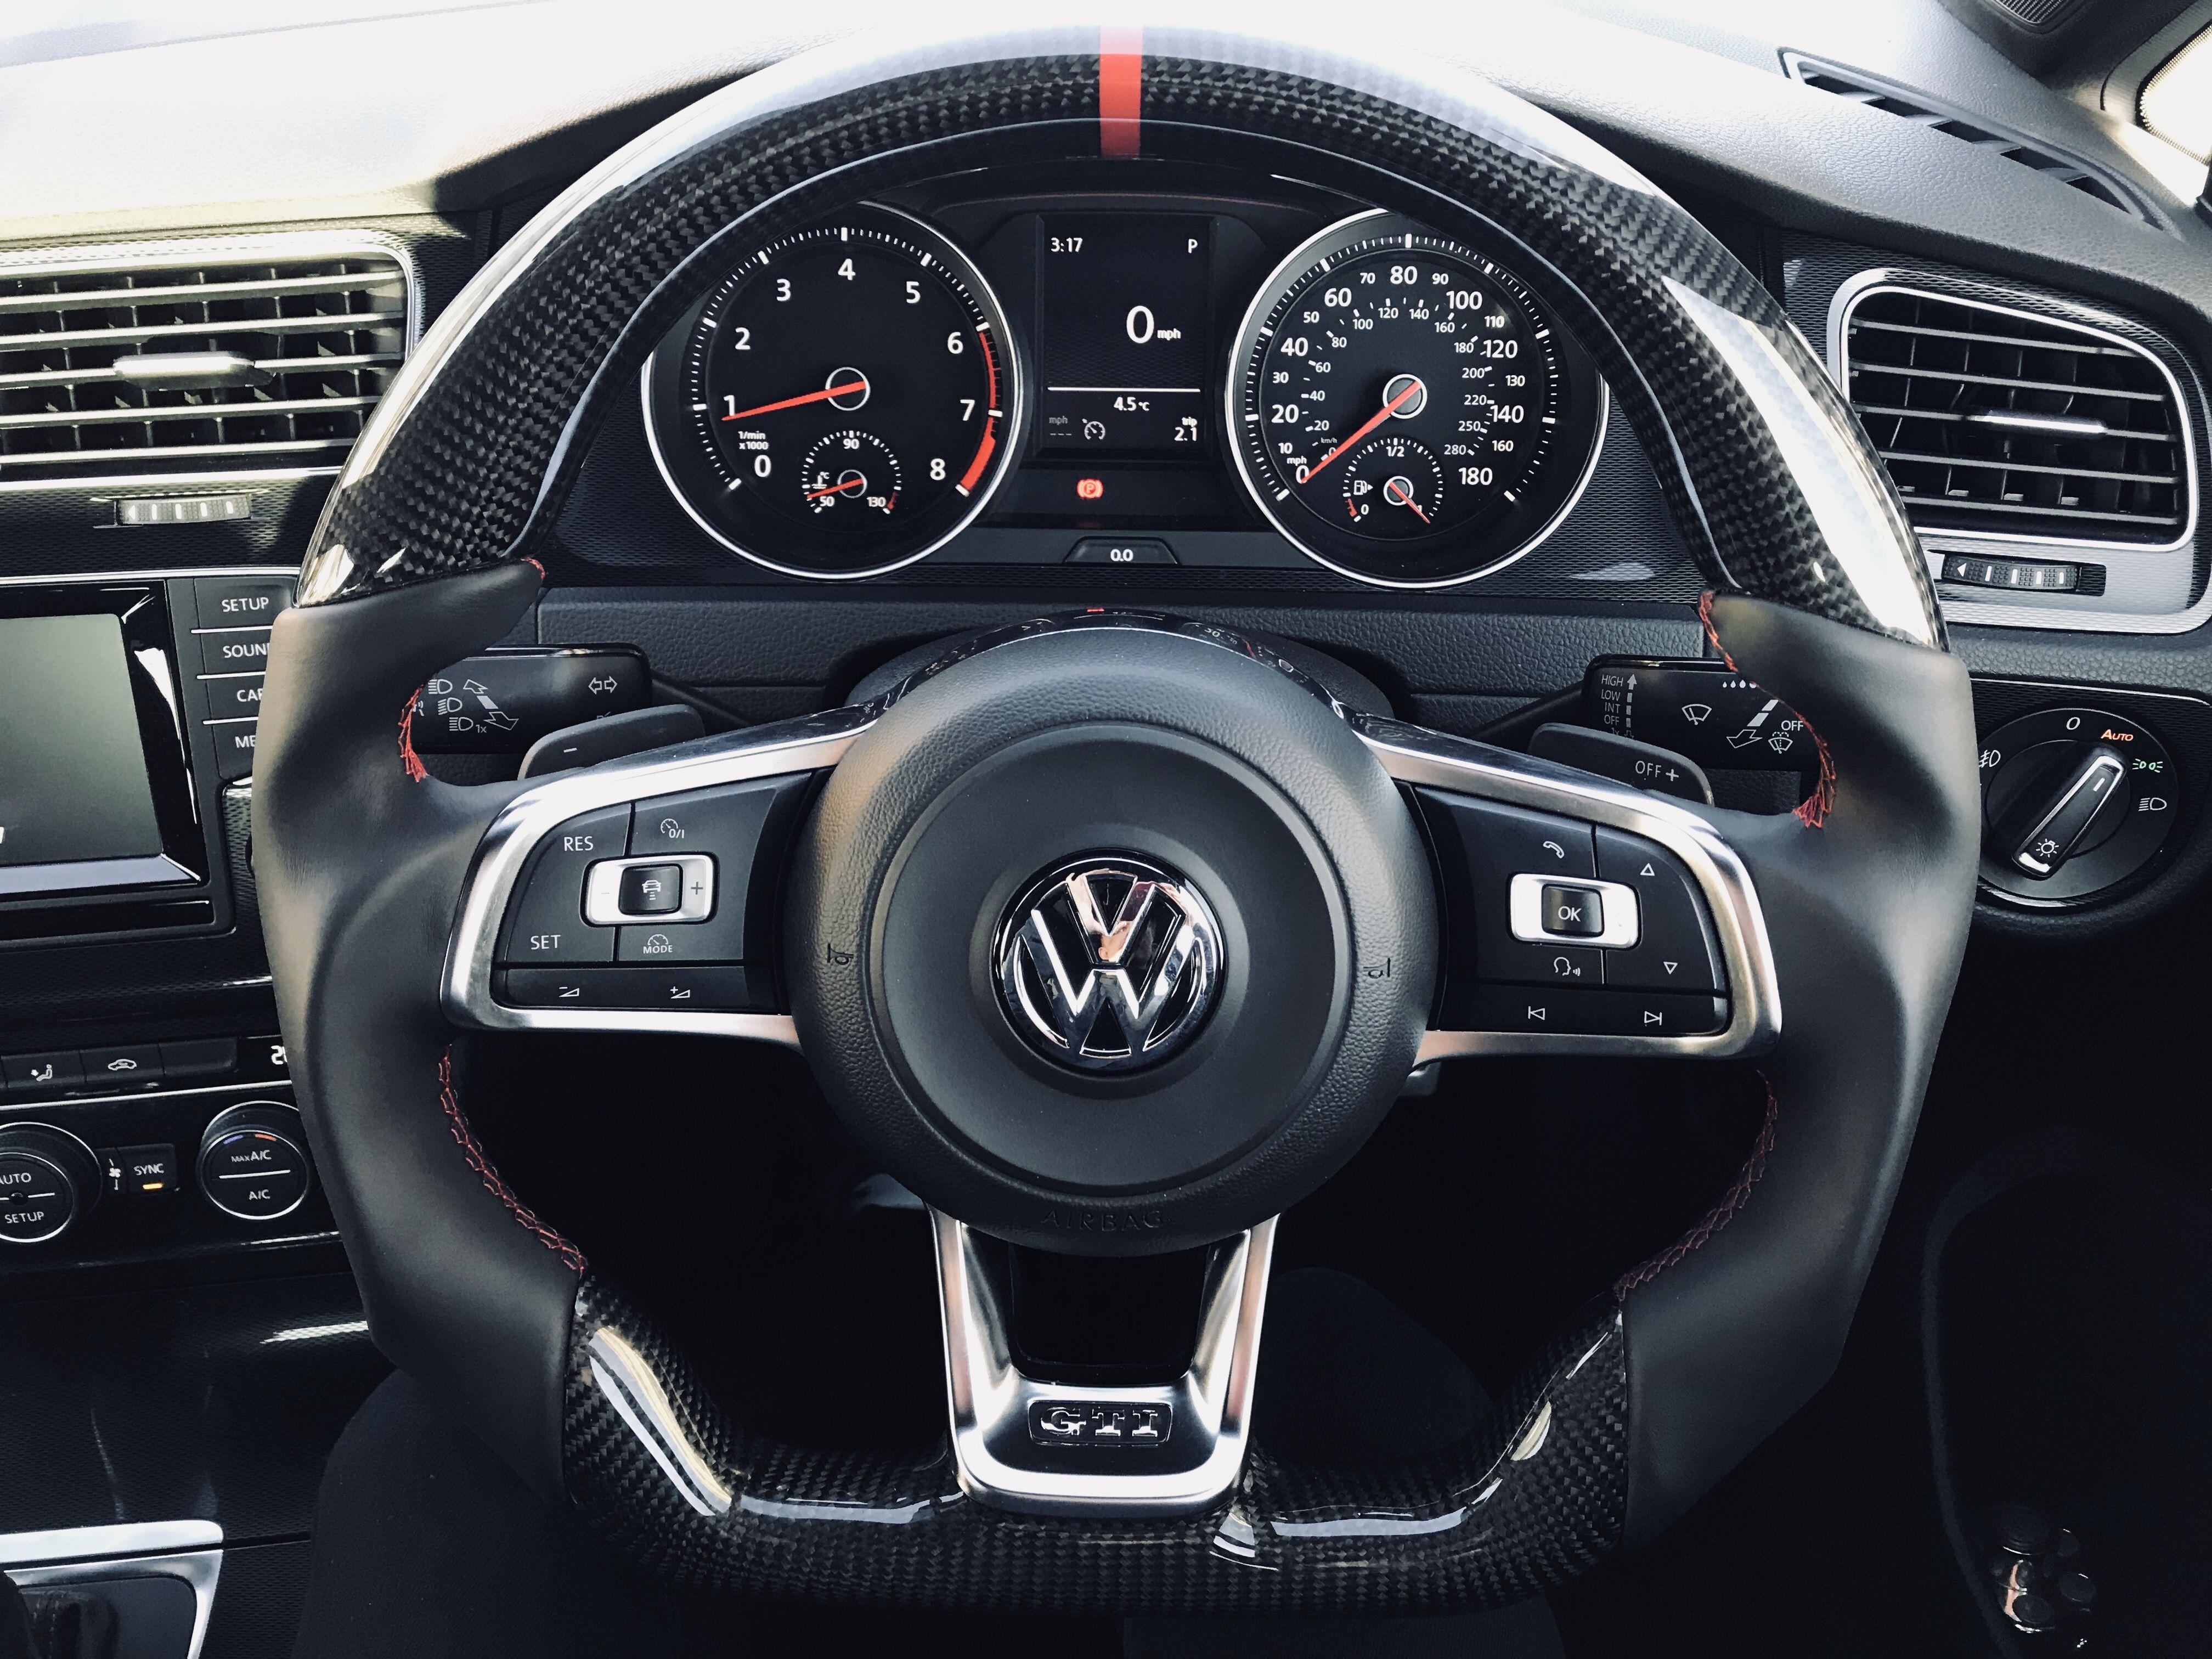 Vw Golf 7 Gti Custom Steering Wheel Carbon Fibre Full Reshape Nappa Leather Red Ring At 12 O Clock And Stit Volkswagen Golf Volkswagen Volkswagen Scirocco